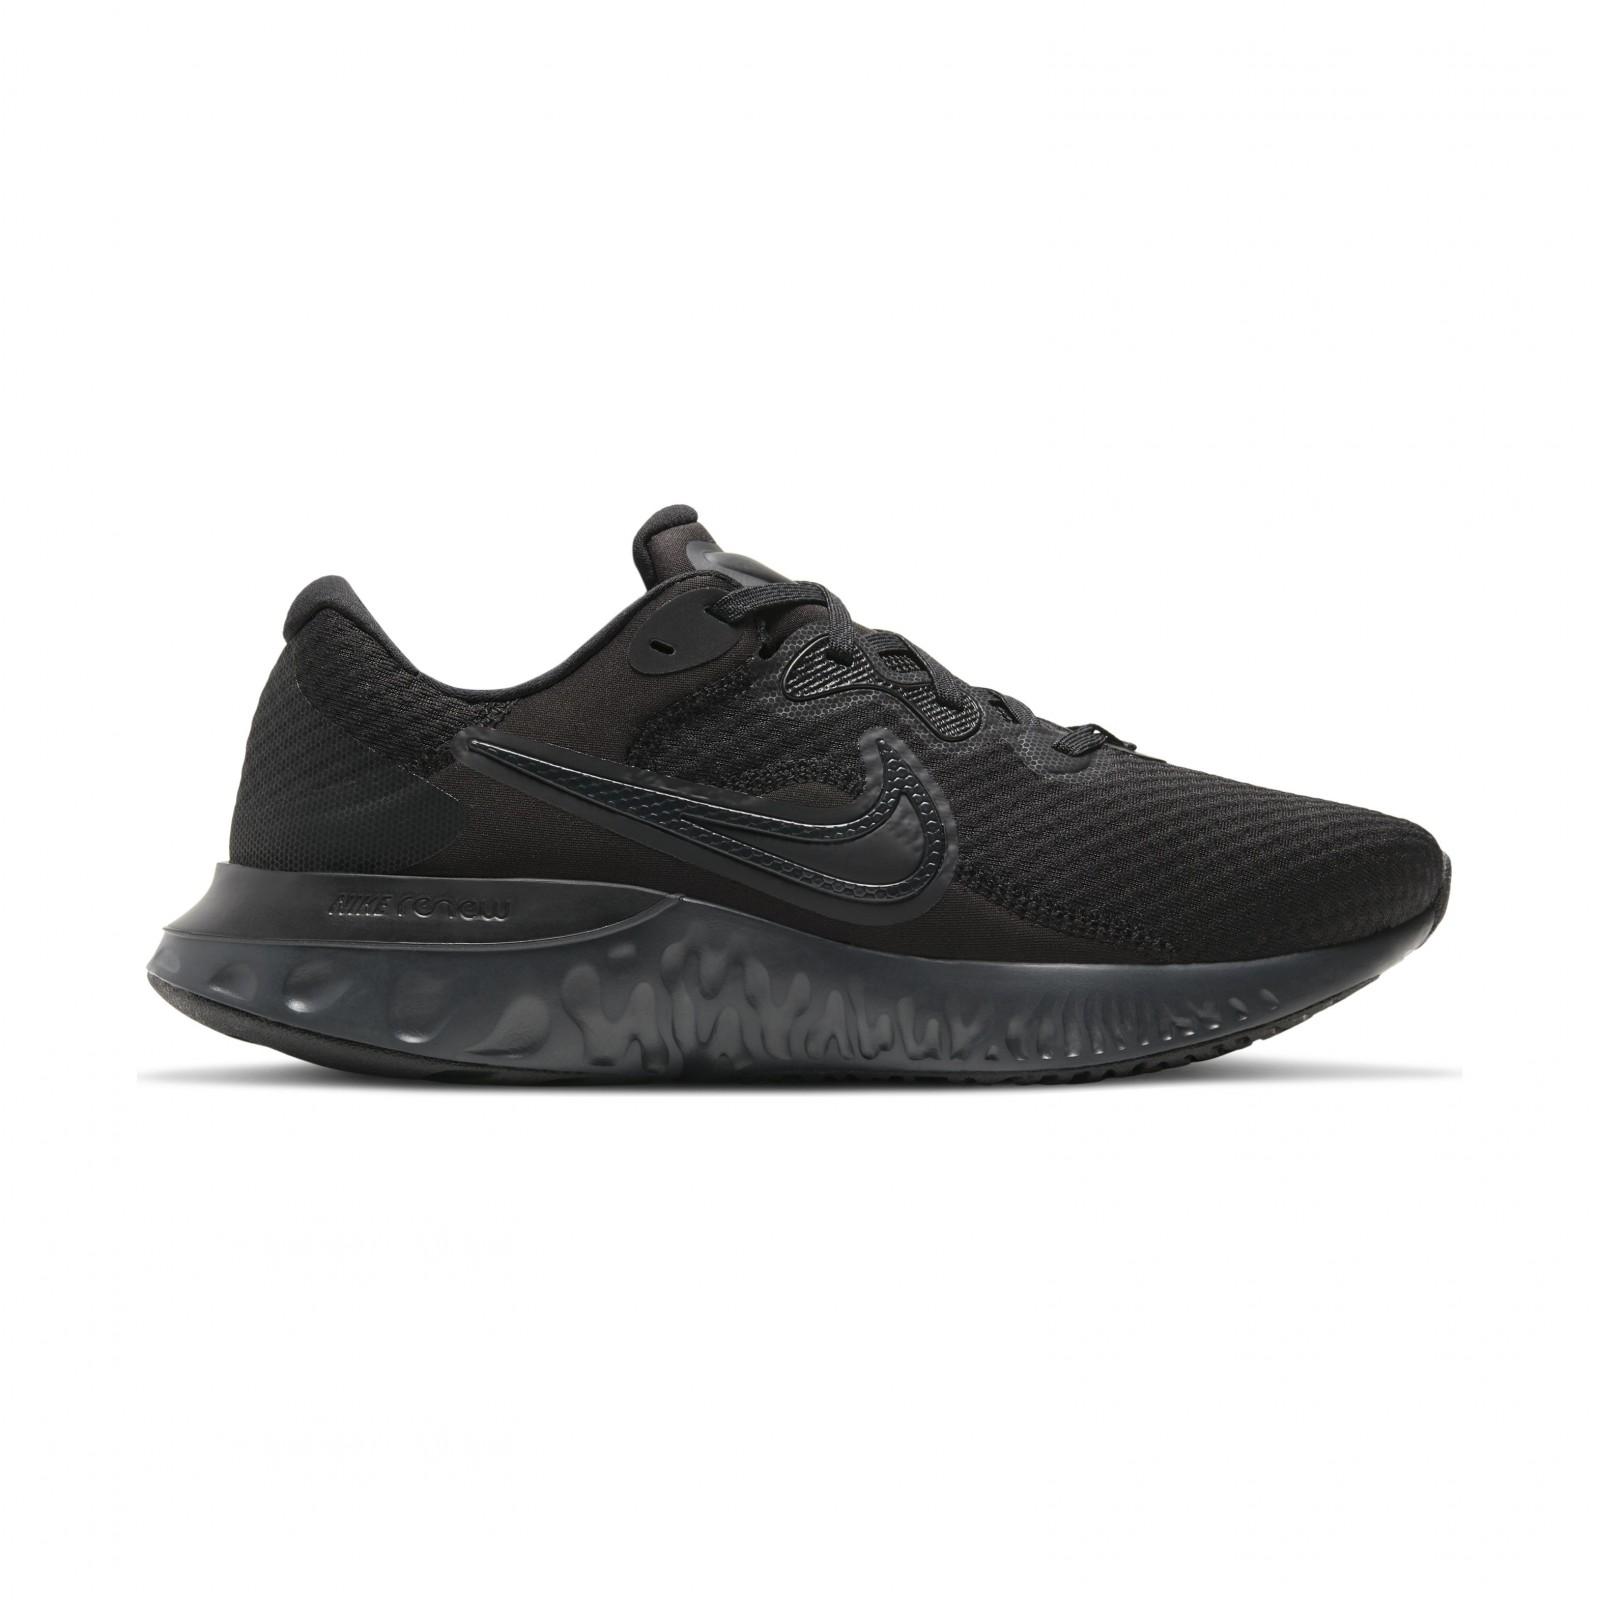 Nike Renew Run 2 BLACK/ANTHRACITE